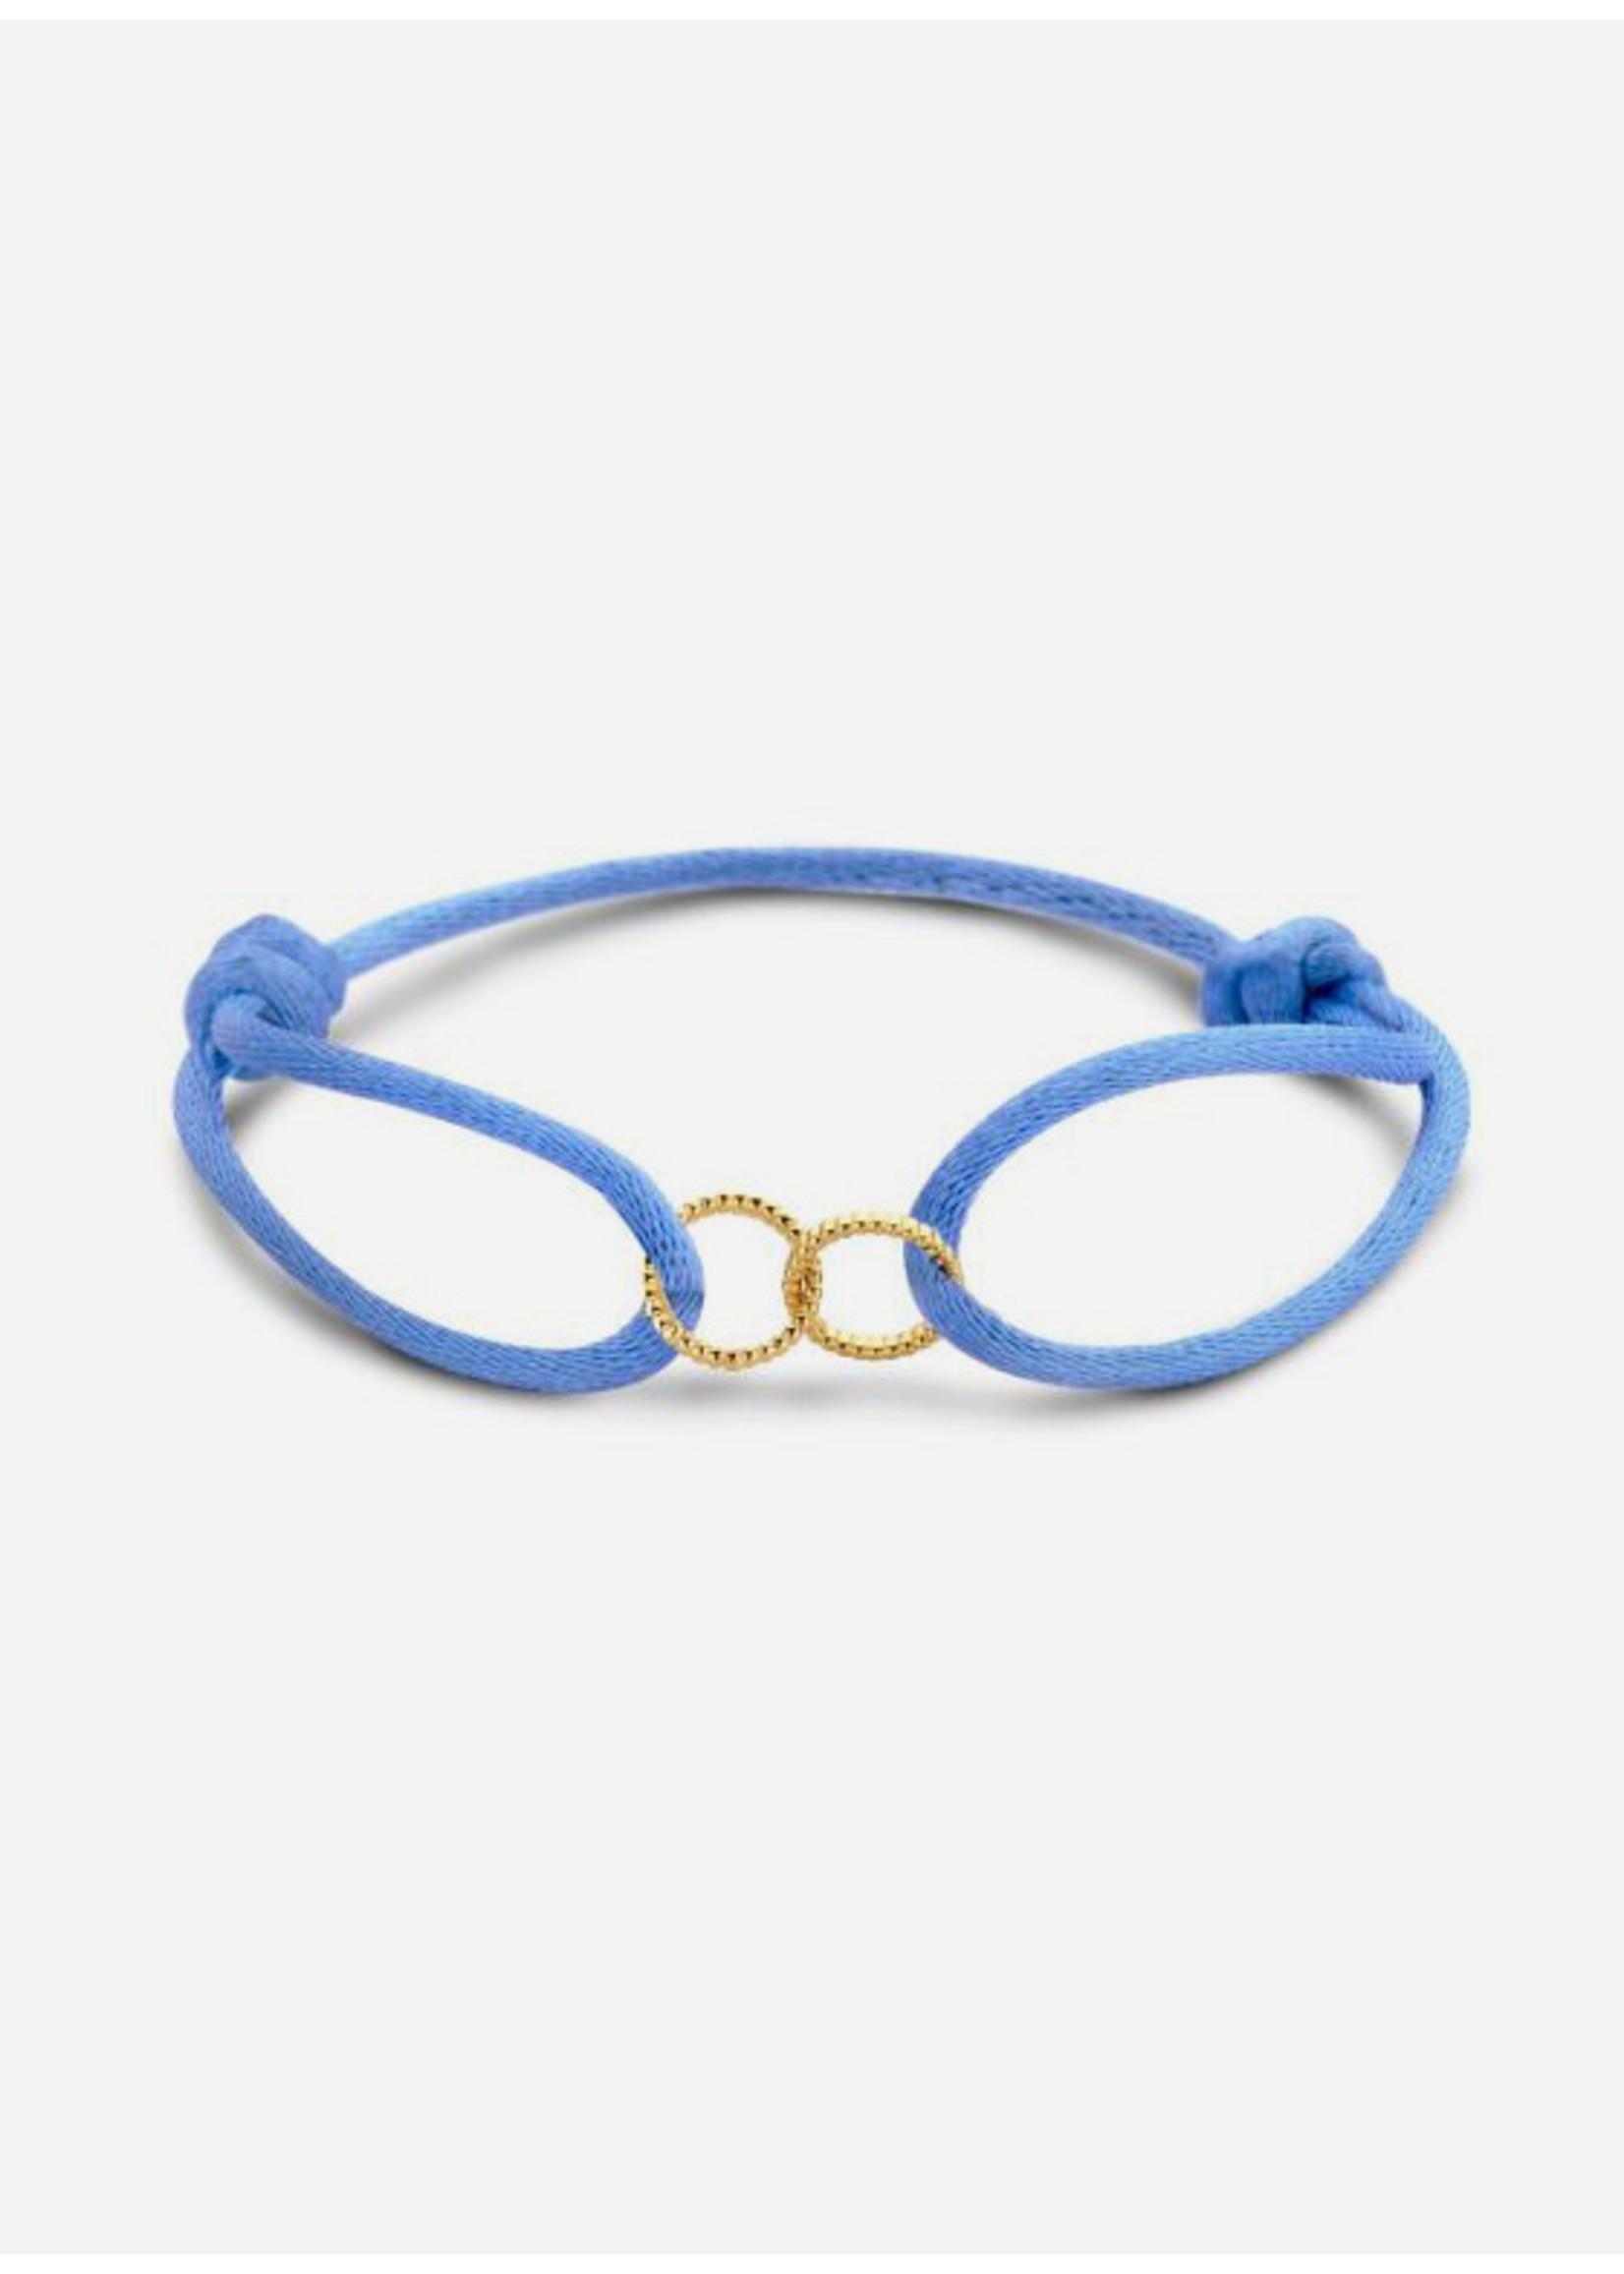 Just Franky Vintage double open circle bracelet cord